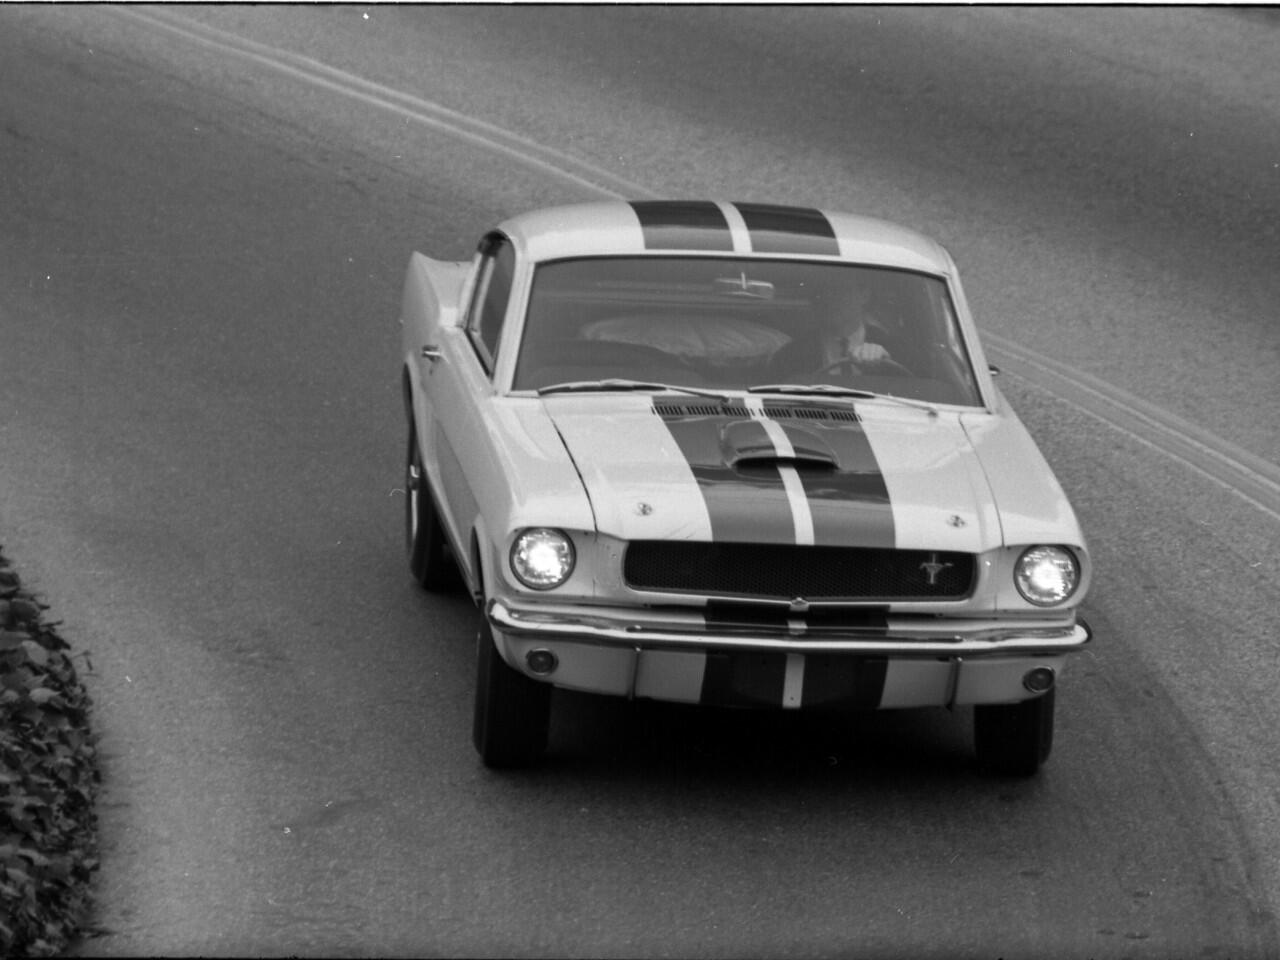 Bild zu 1965er Shelby GT350 Mustang Prototyp